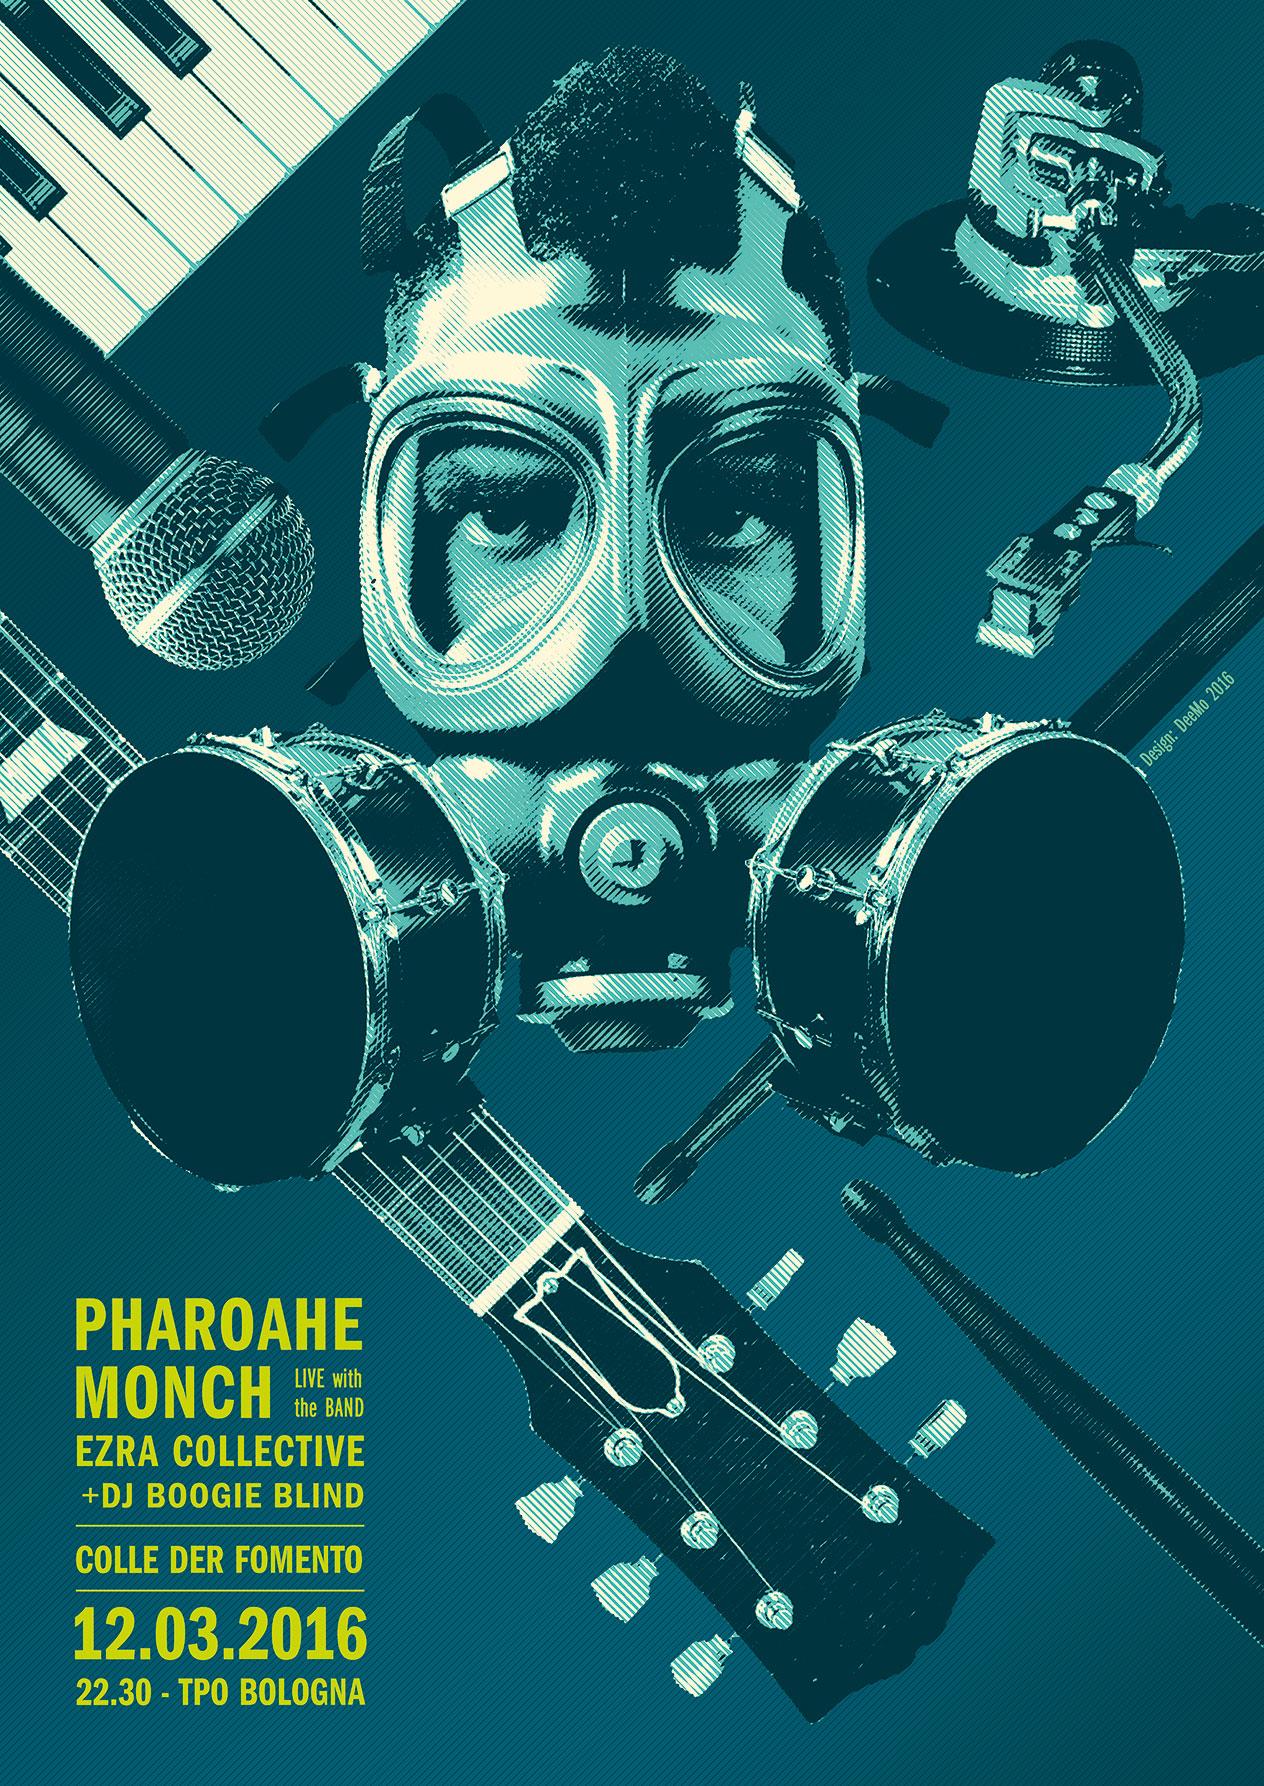 Pharohae Monch+Ezra Collective+Colle Der fomento @TPO 12 Marzo 2016